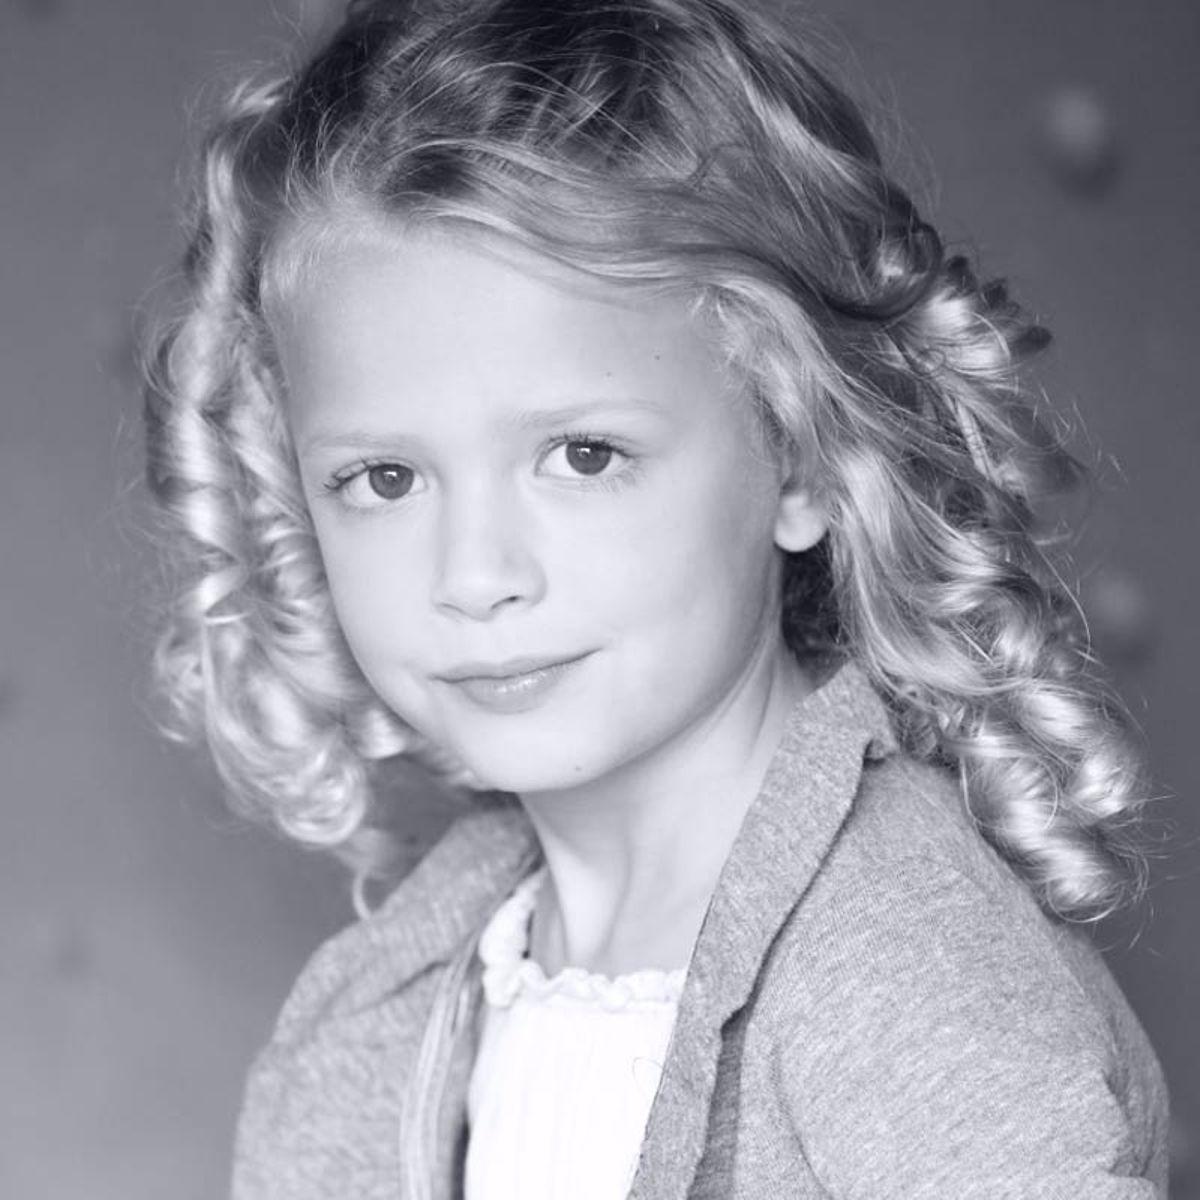 Giselle Eisenberg